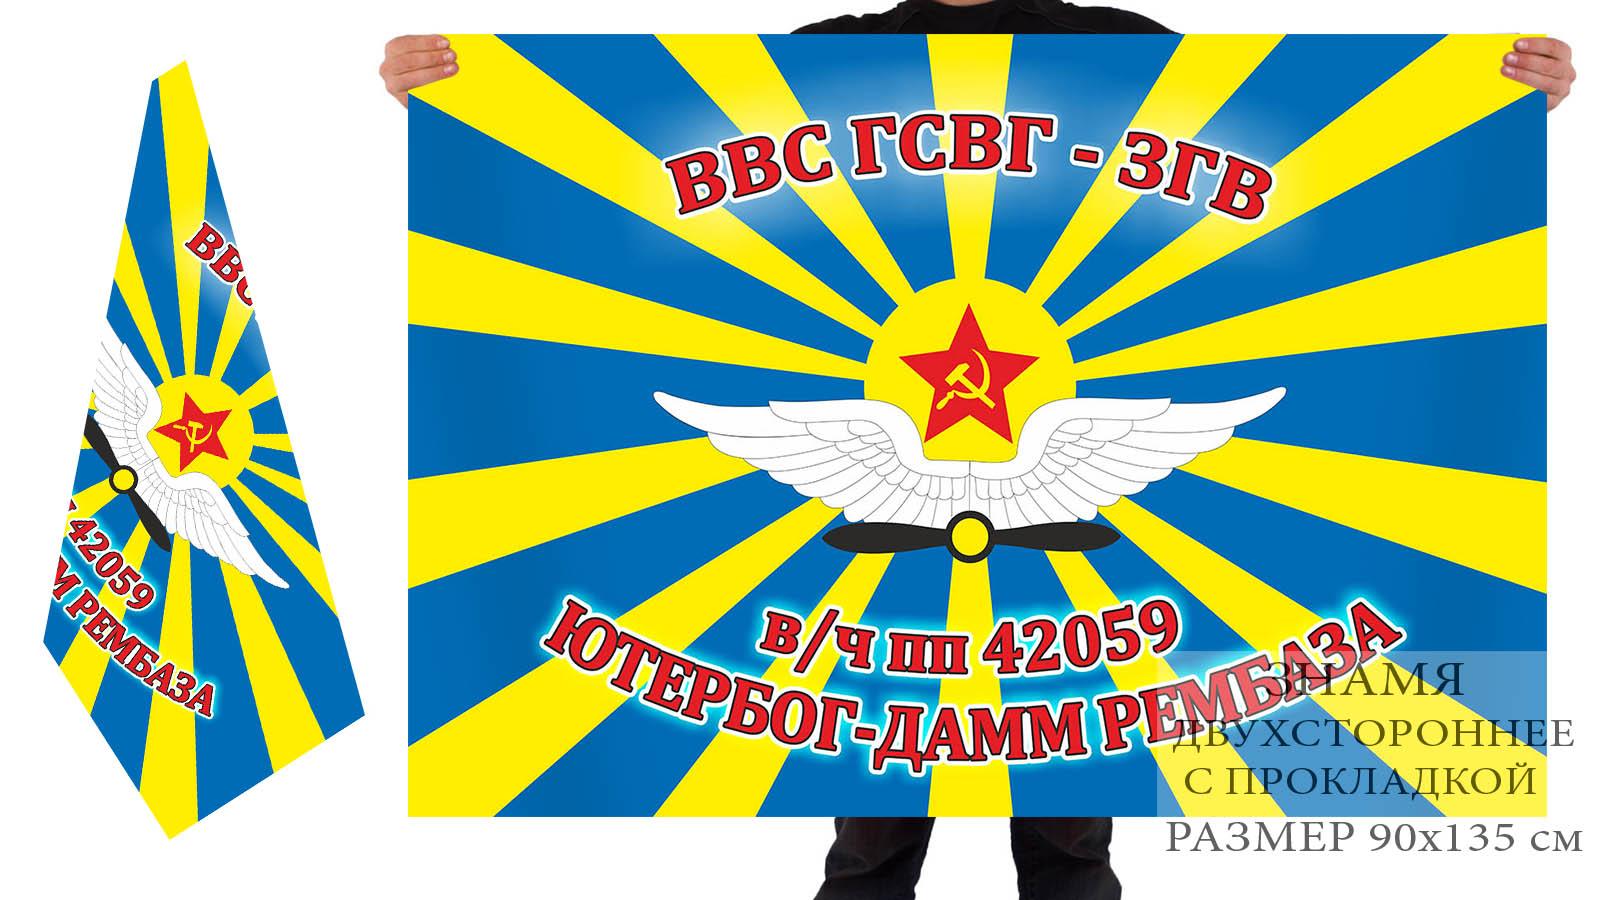 Флаг ВВС Ютербог-Дамм рембаза ВВС 42059